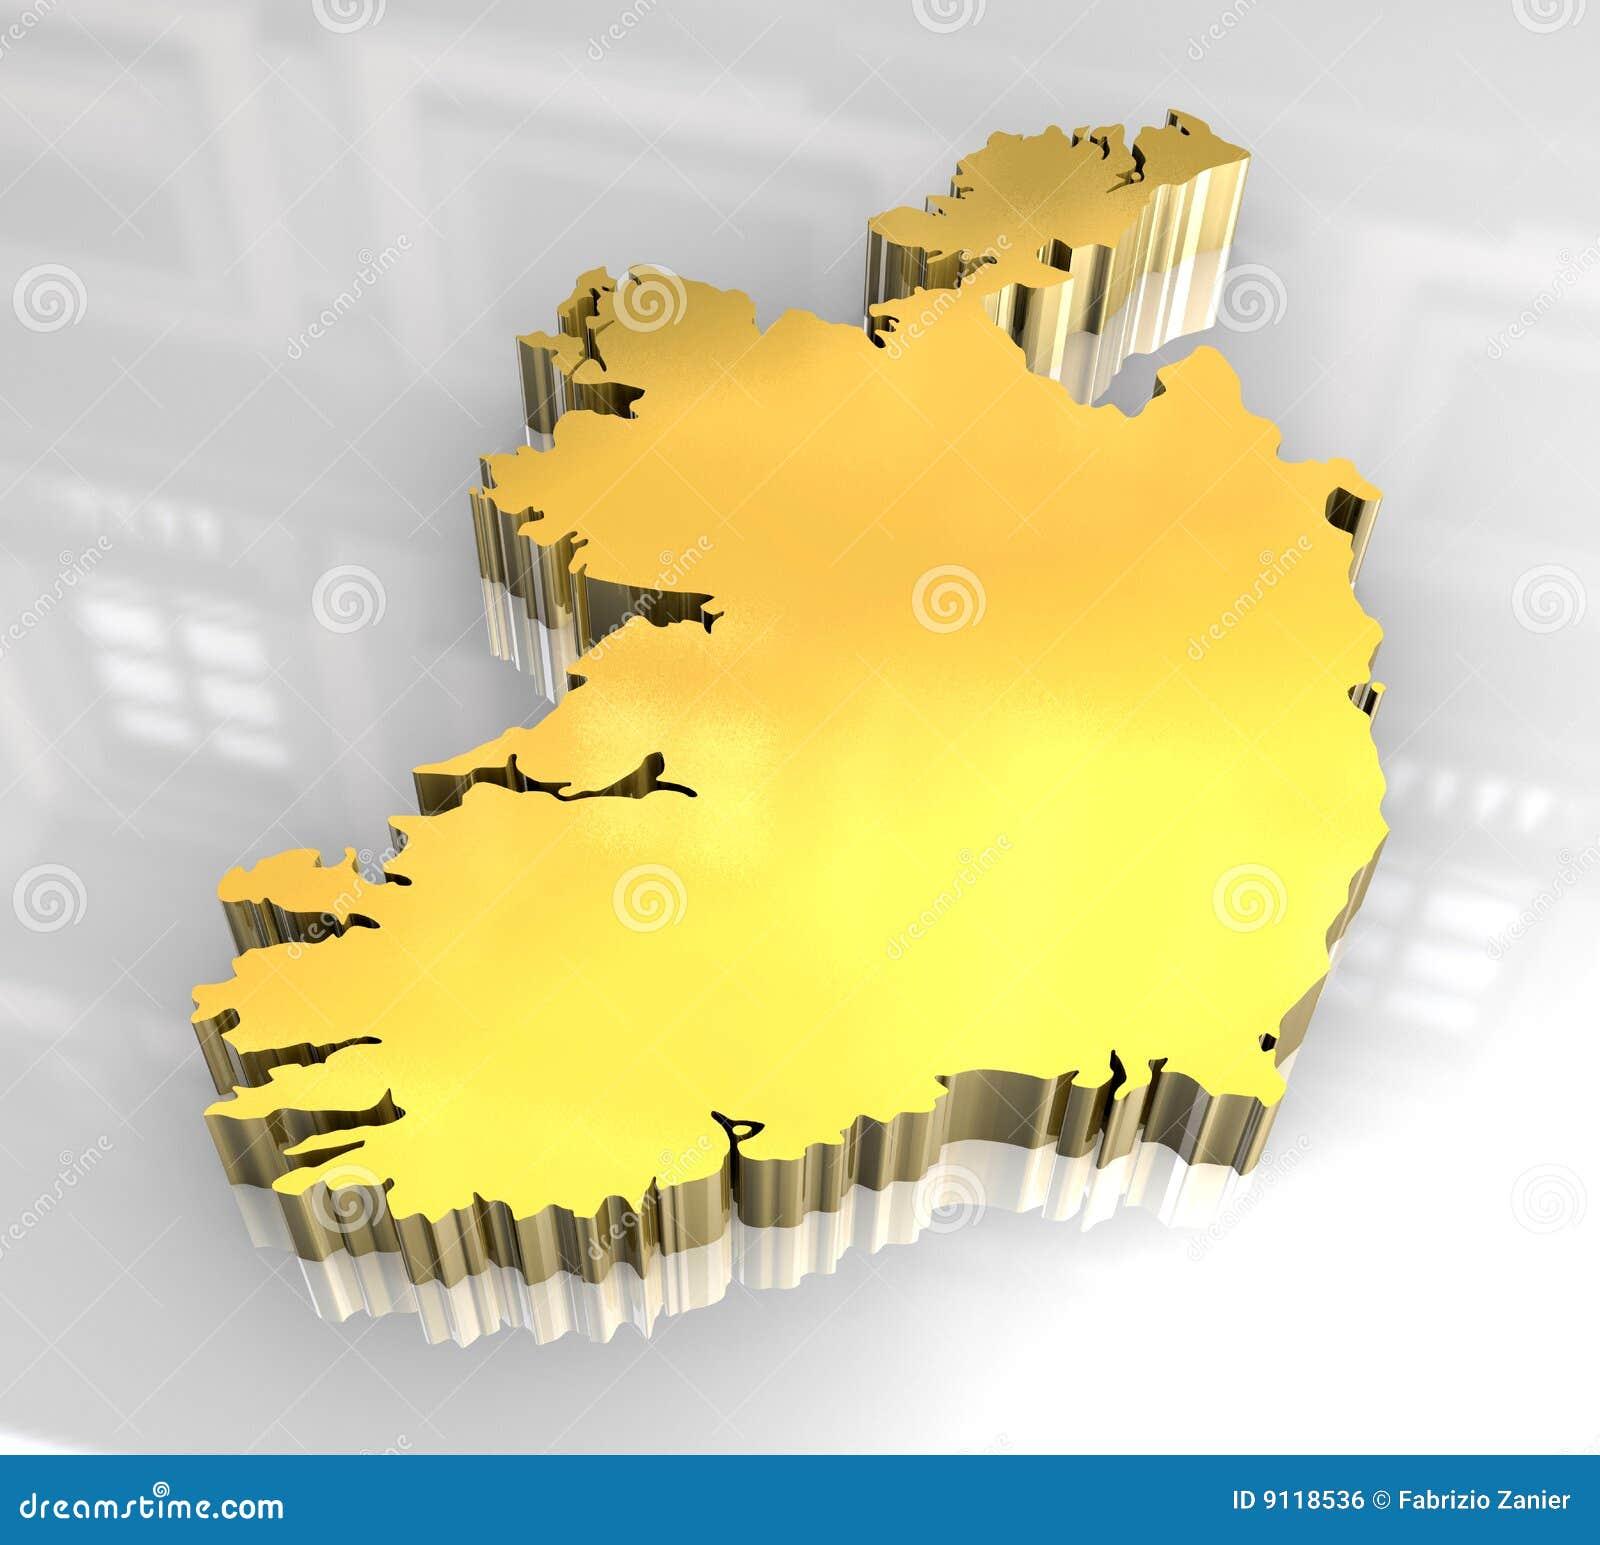 Map Of Ireland 3d.3d Golden Map Of Ireland Stock Illustration Illustration Of Ireland